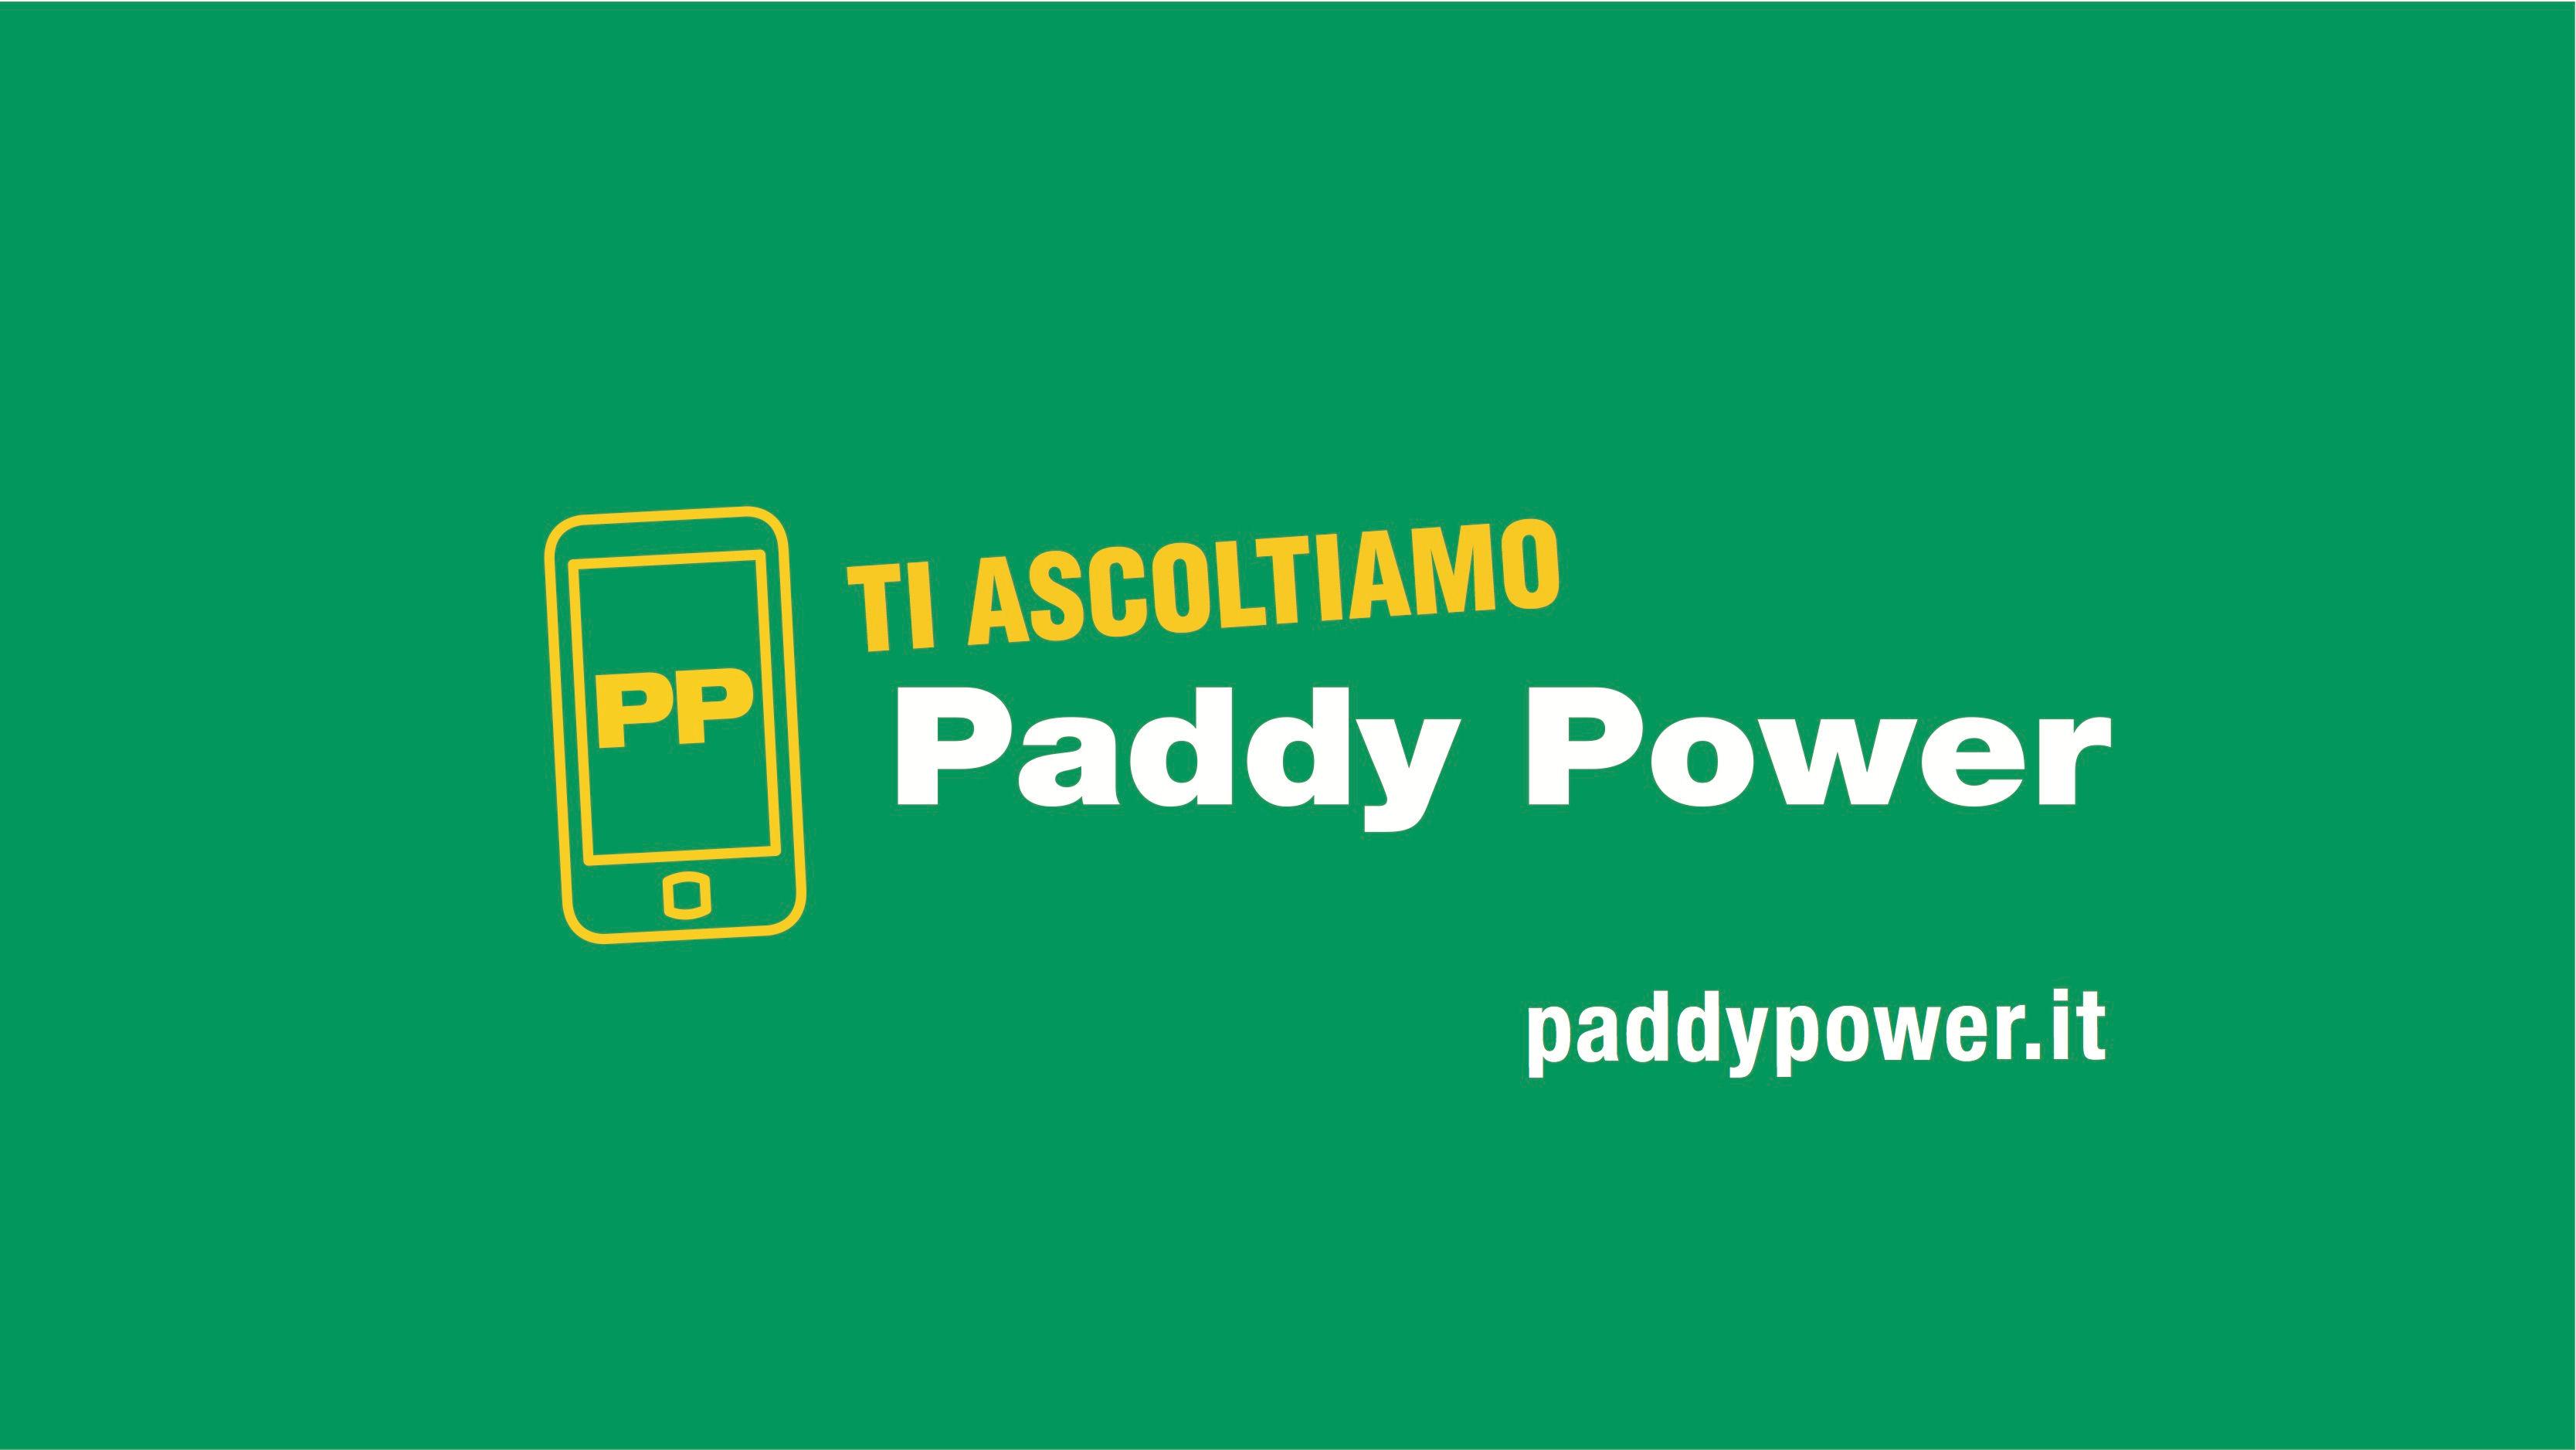 paddy power scommesse giochi online